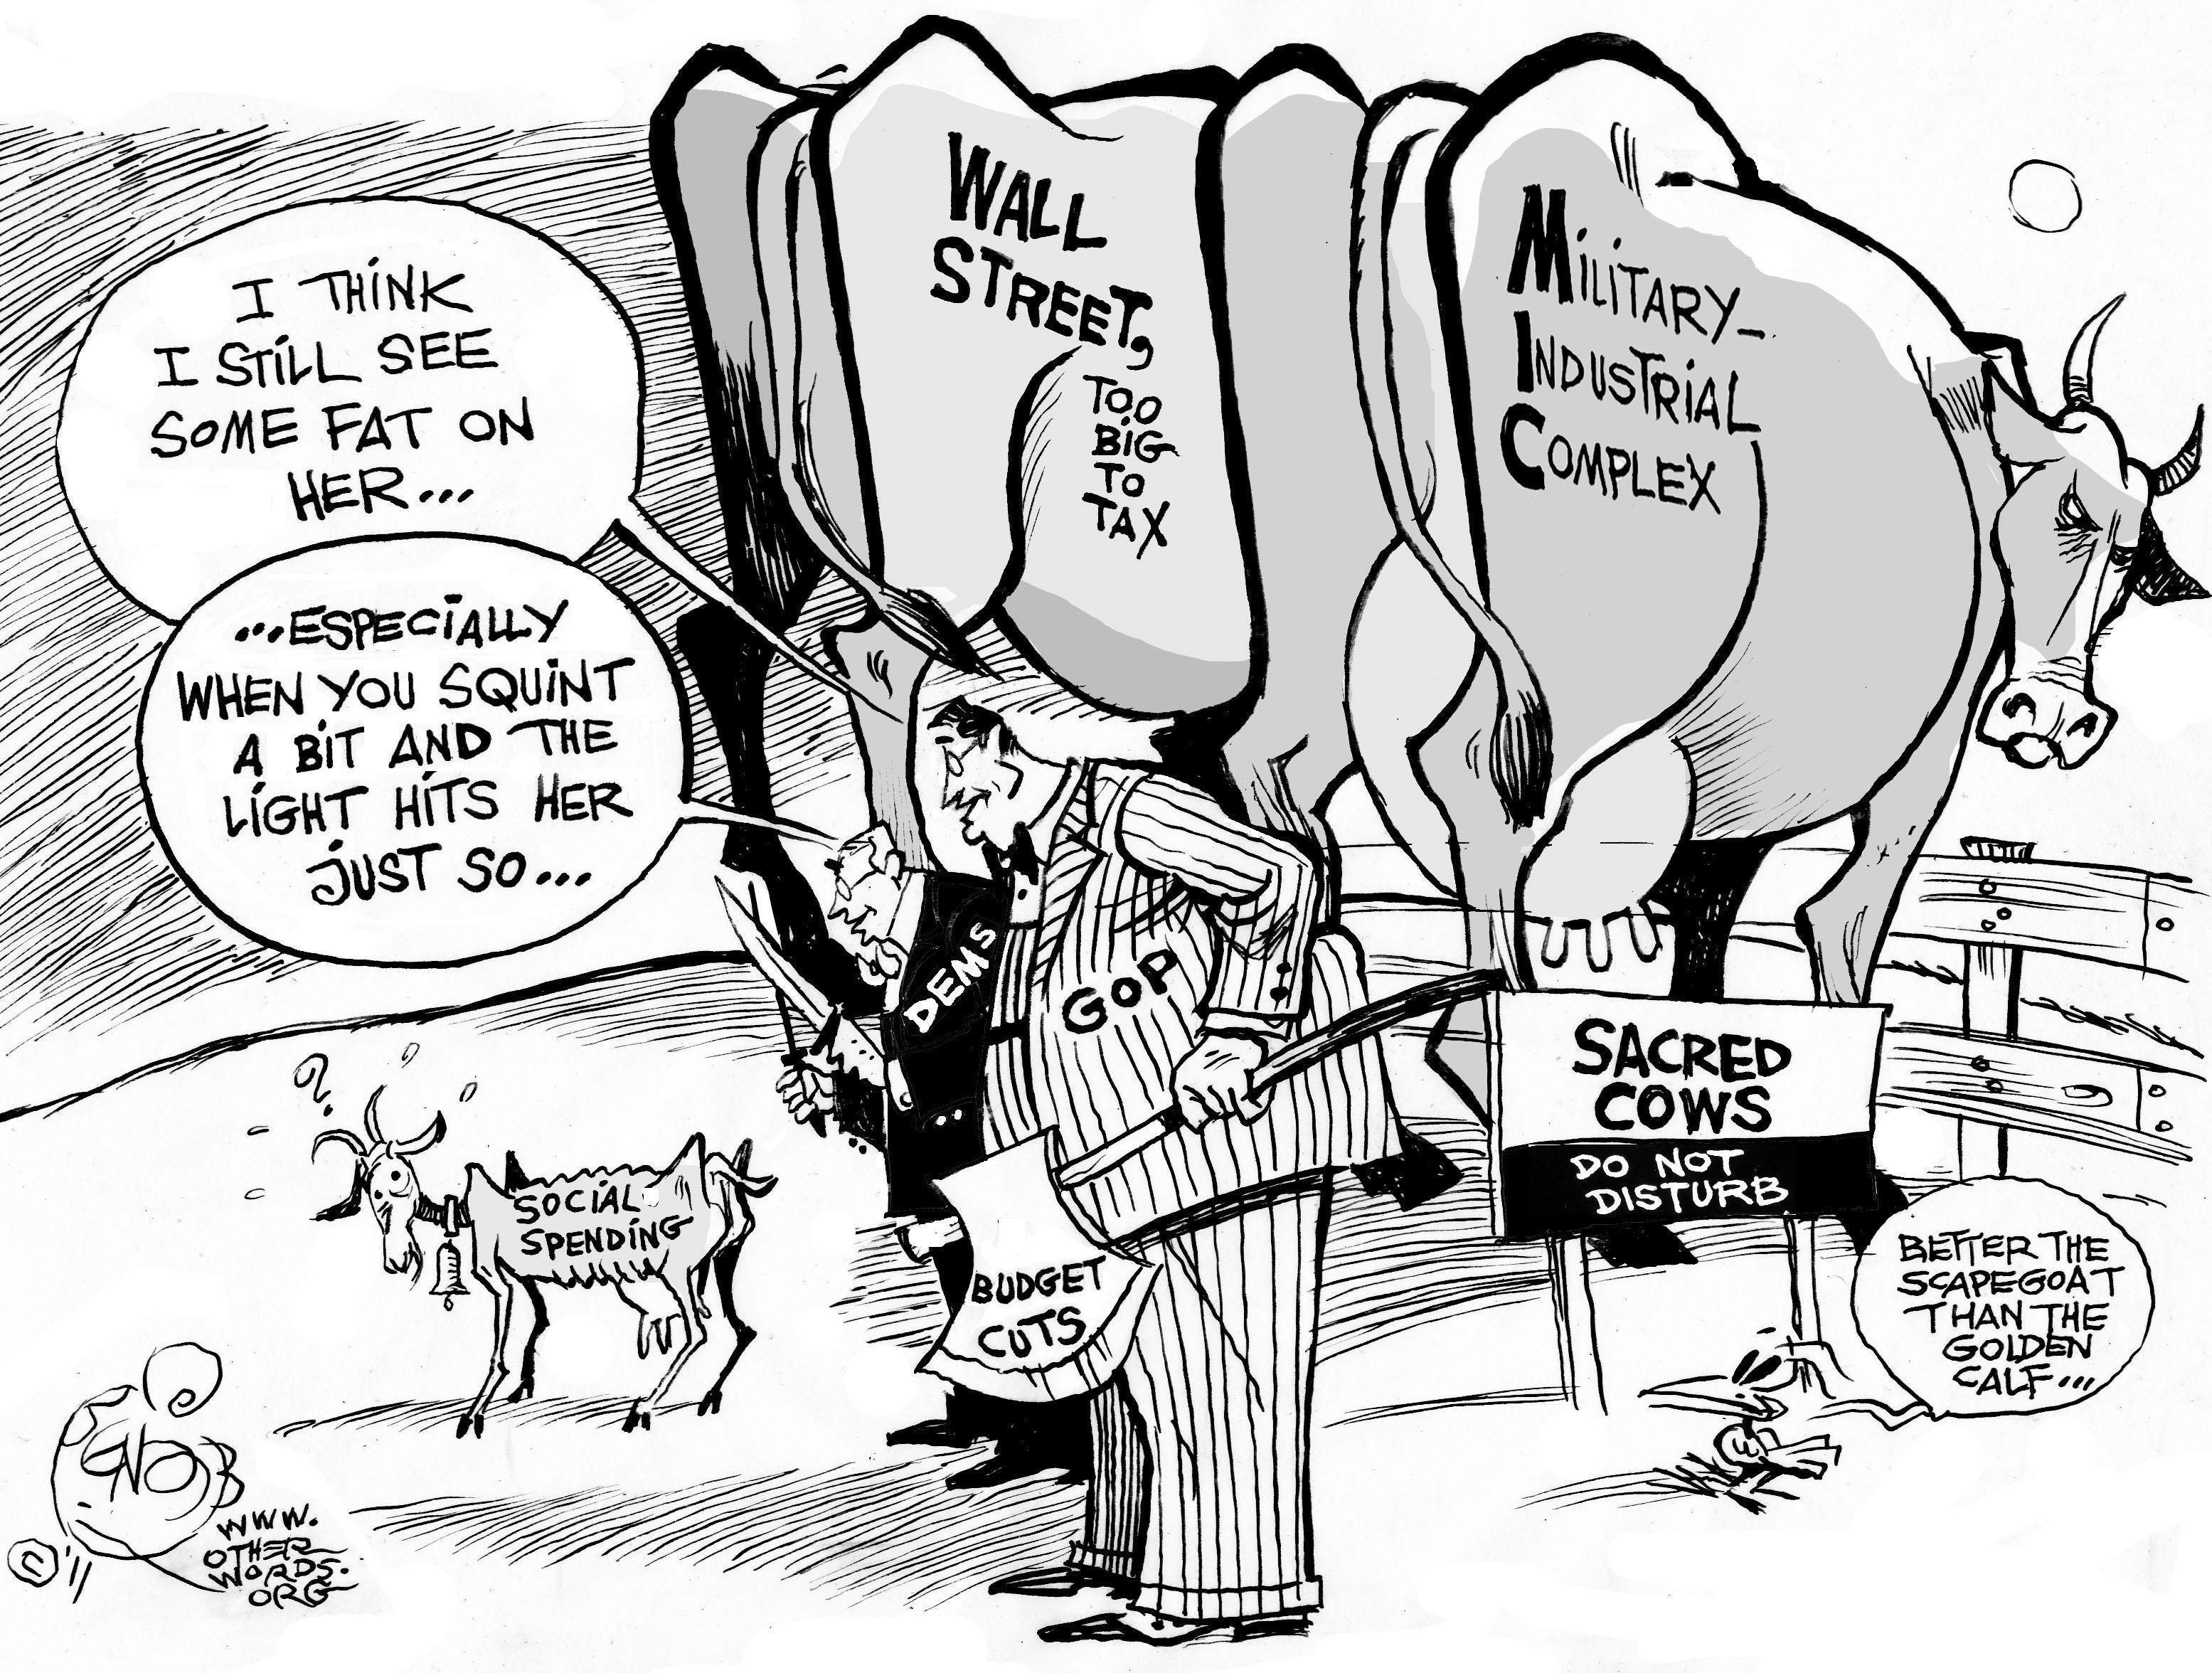 Scapegoating Social Spending